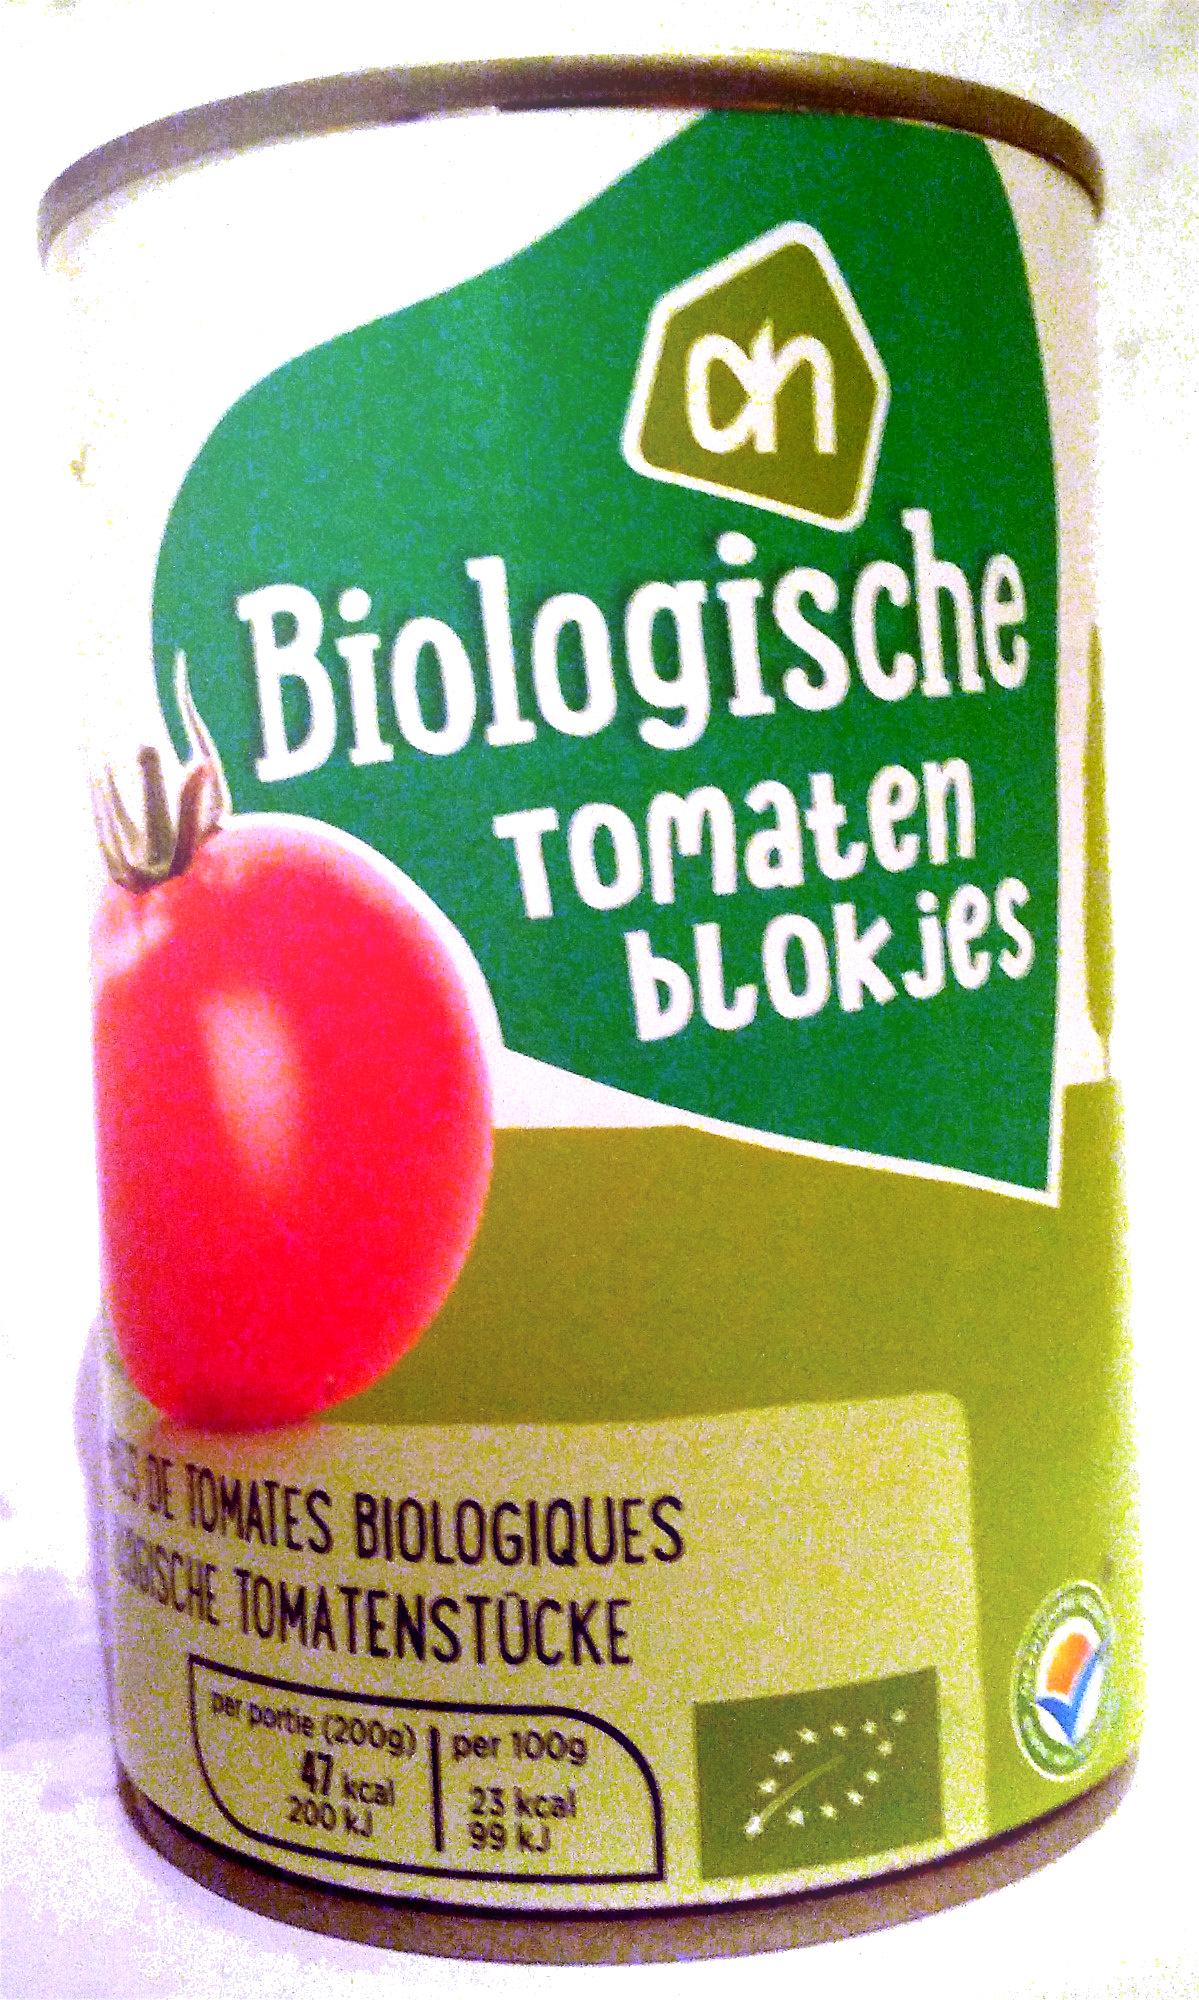 Biologische tomatenblokjes - Product - nl